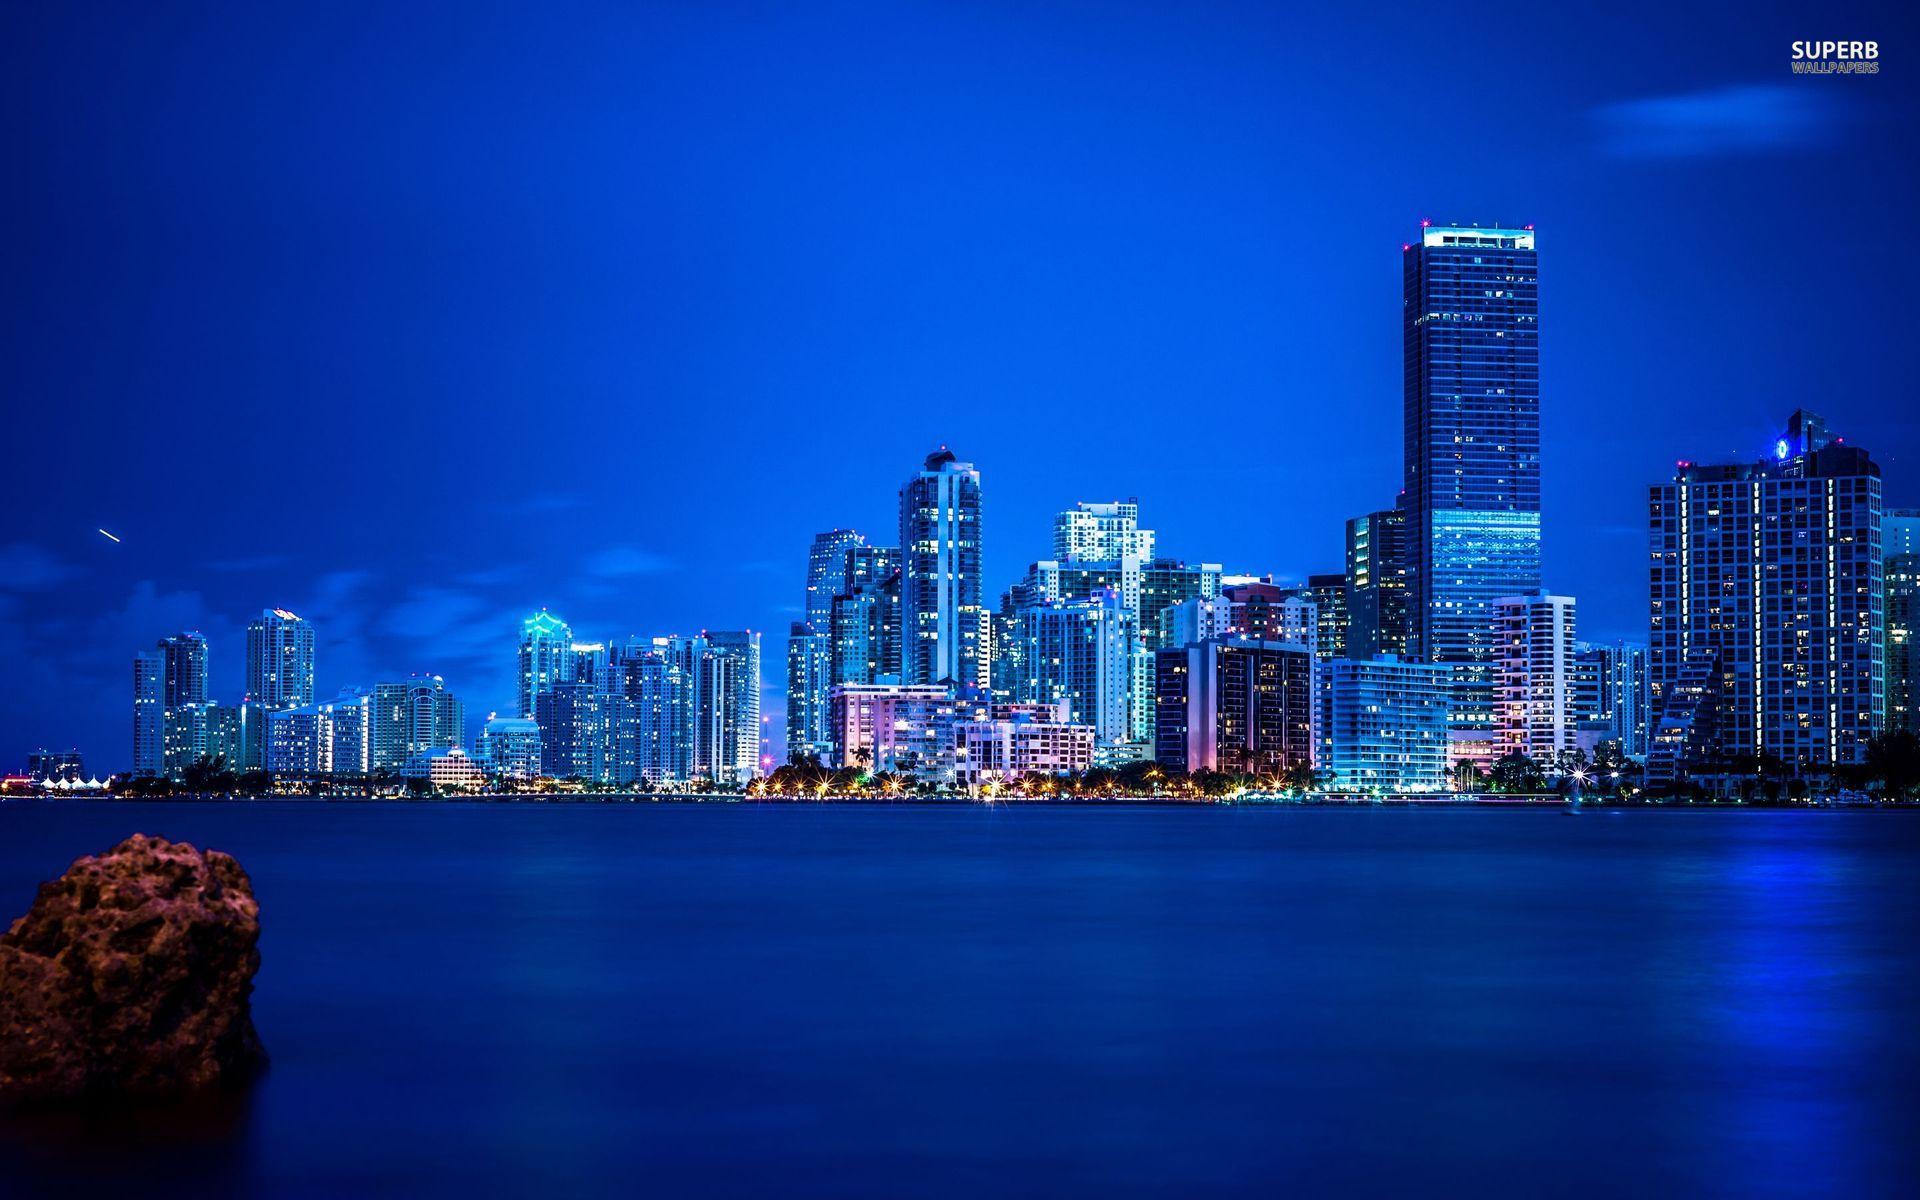 Miami night skyline wallpaper 1920x1200 1920x1200